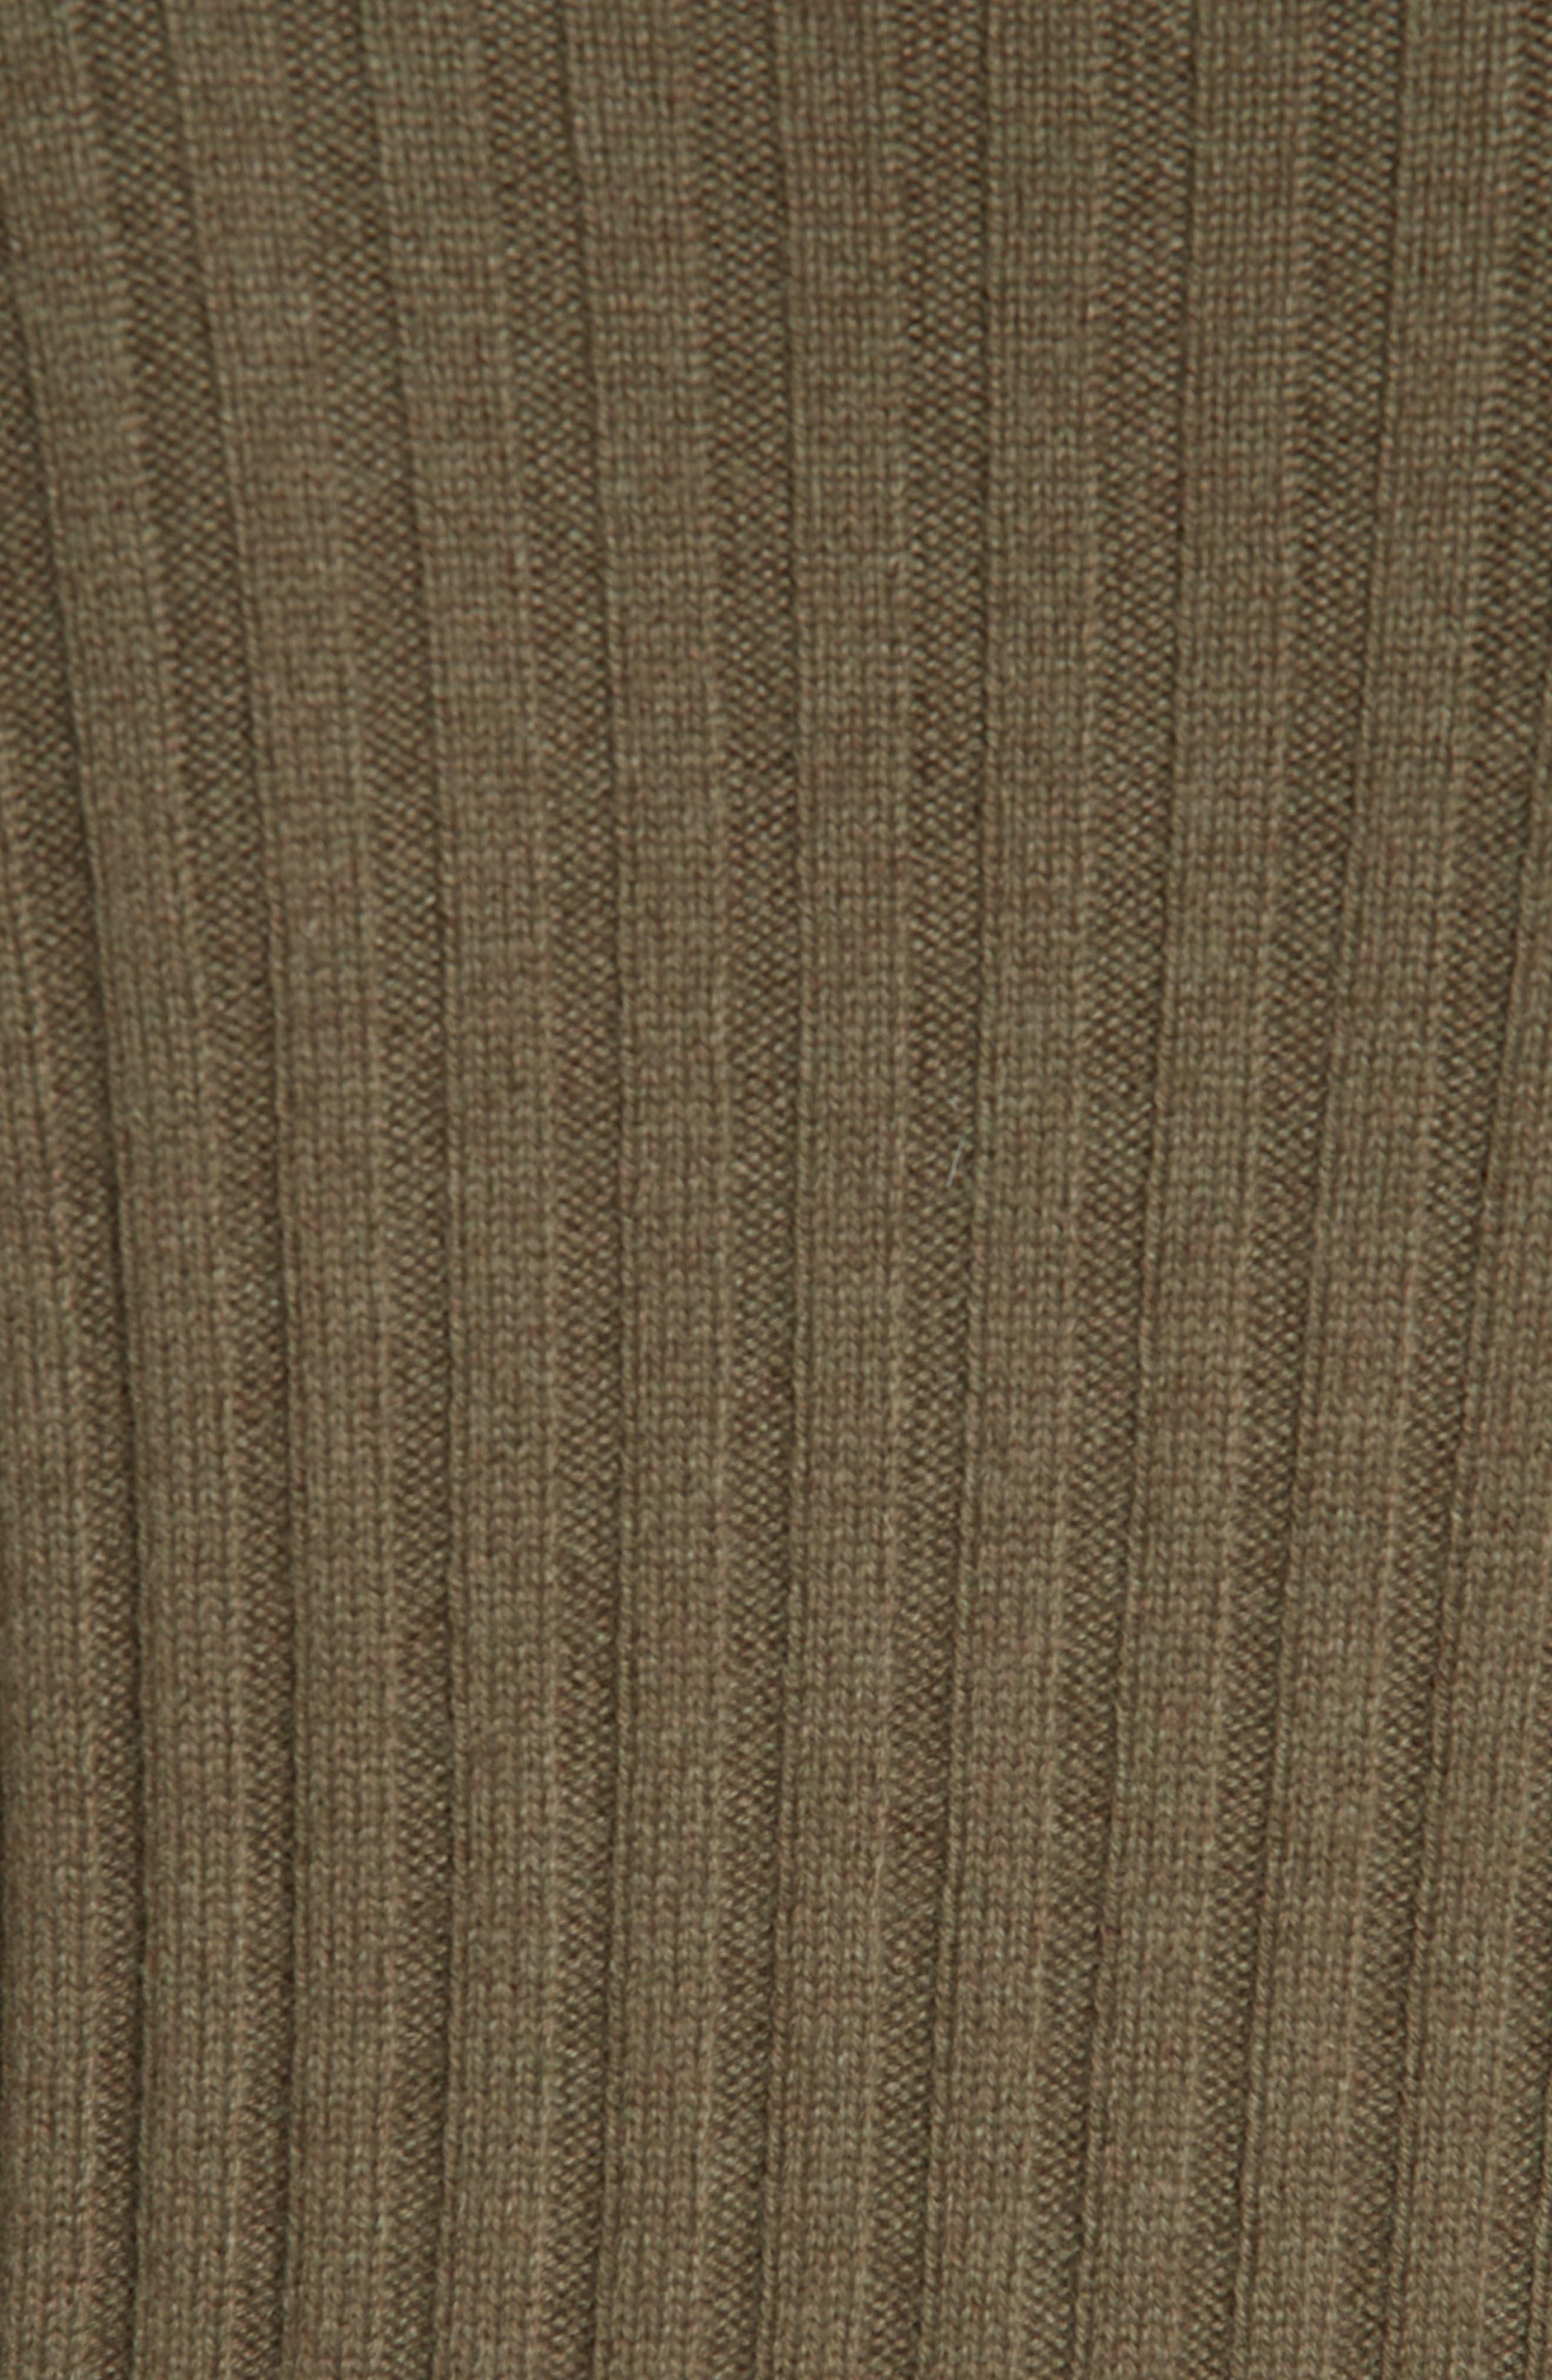 Rib Knit Cashmere Tunic,                             Alternate thumbnail 5, color,                             OLIVE IVY HEATHER